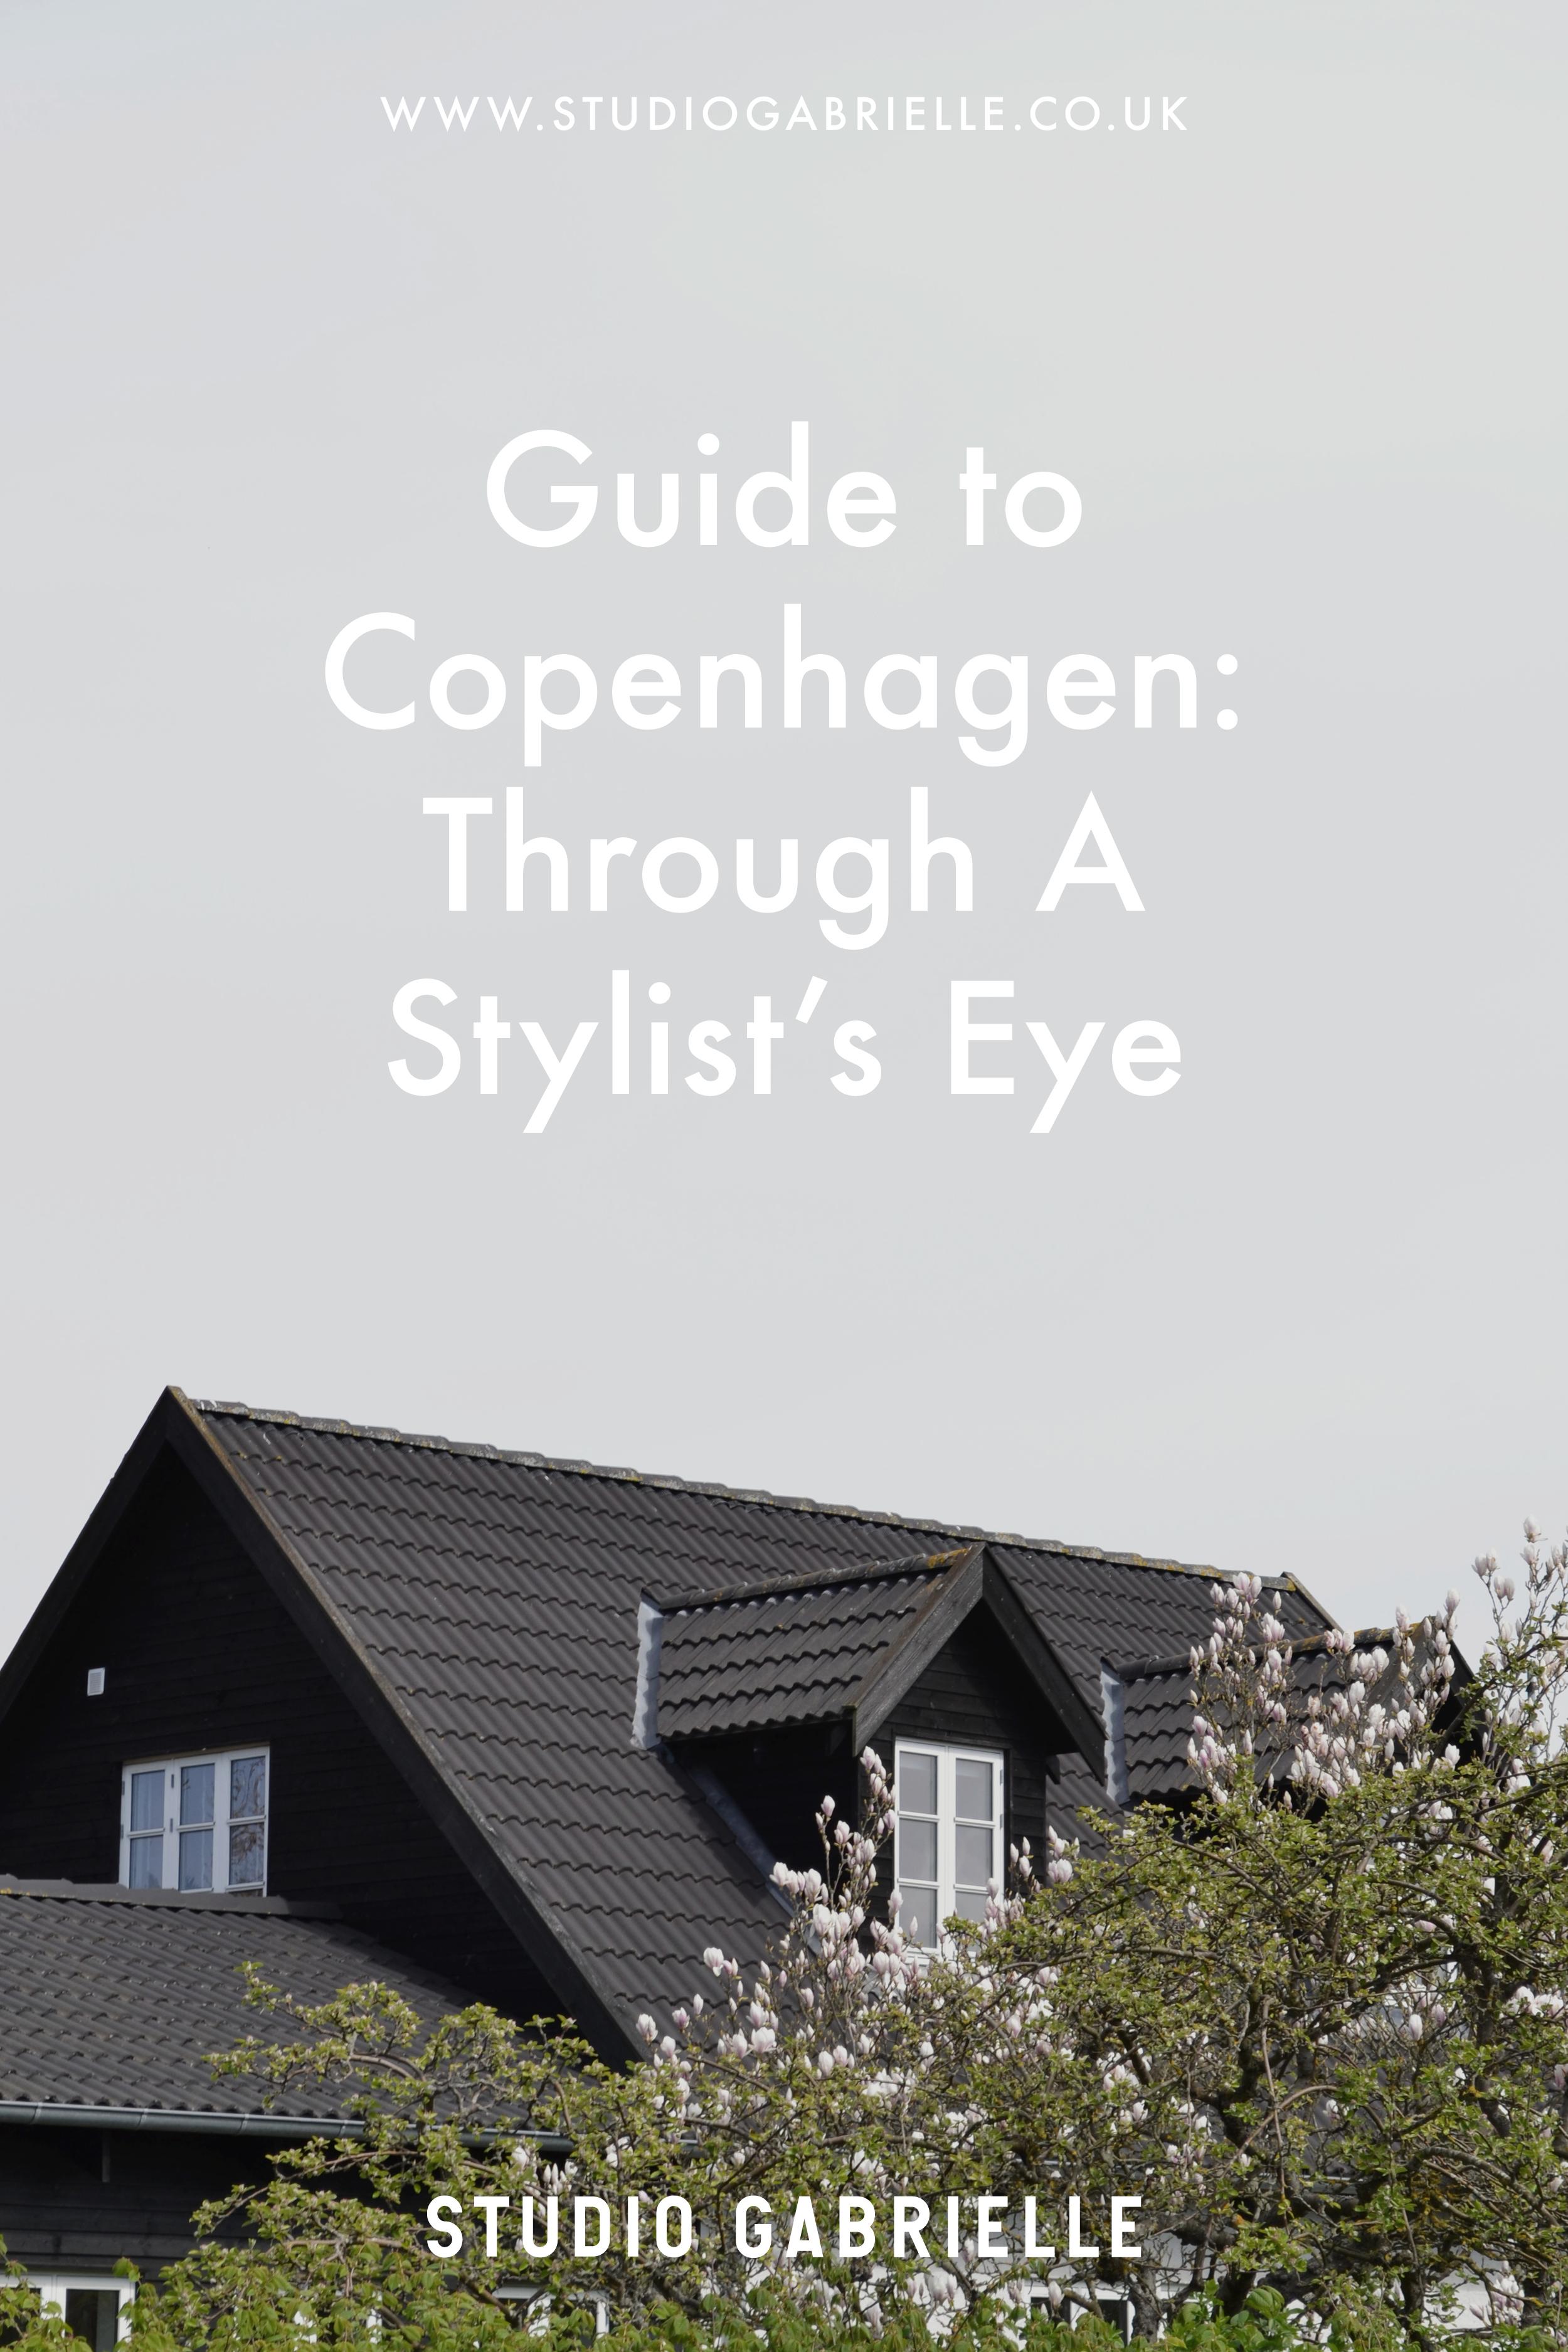 StudioGabrielle_Guide_Copenhagen_StylistEye_Pinterest